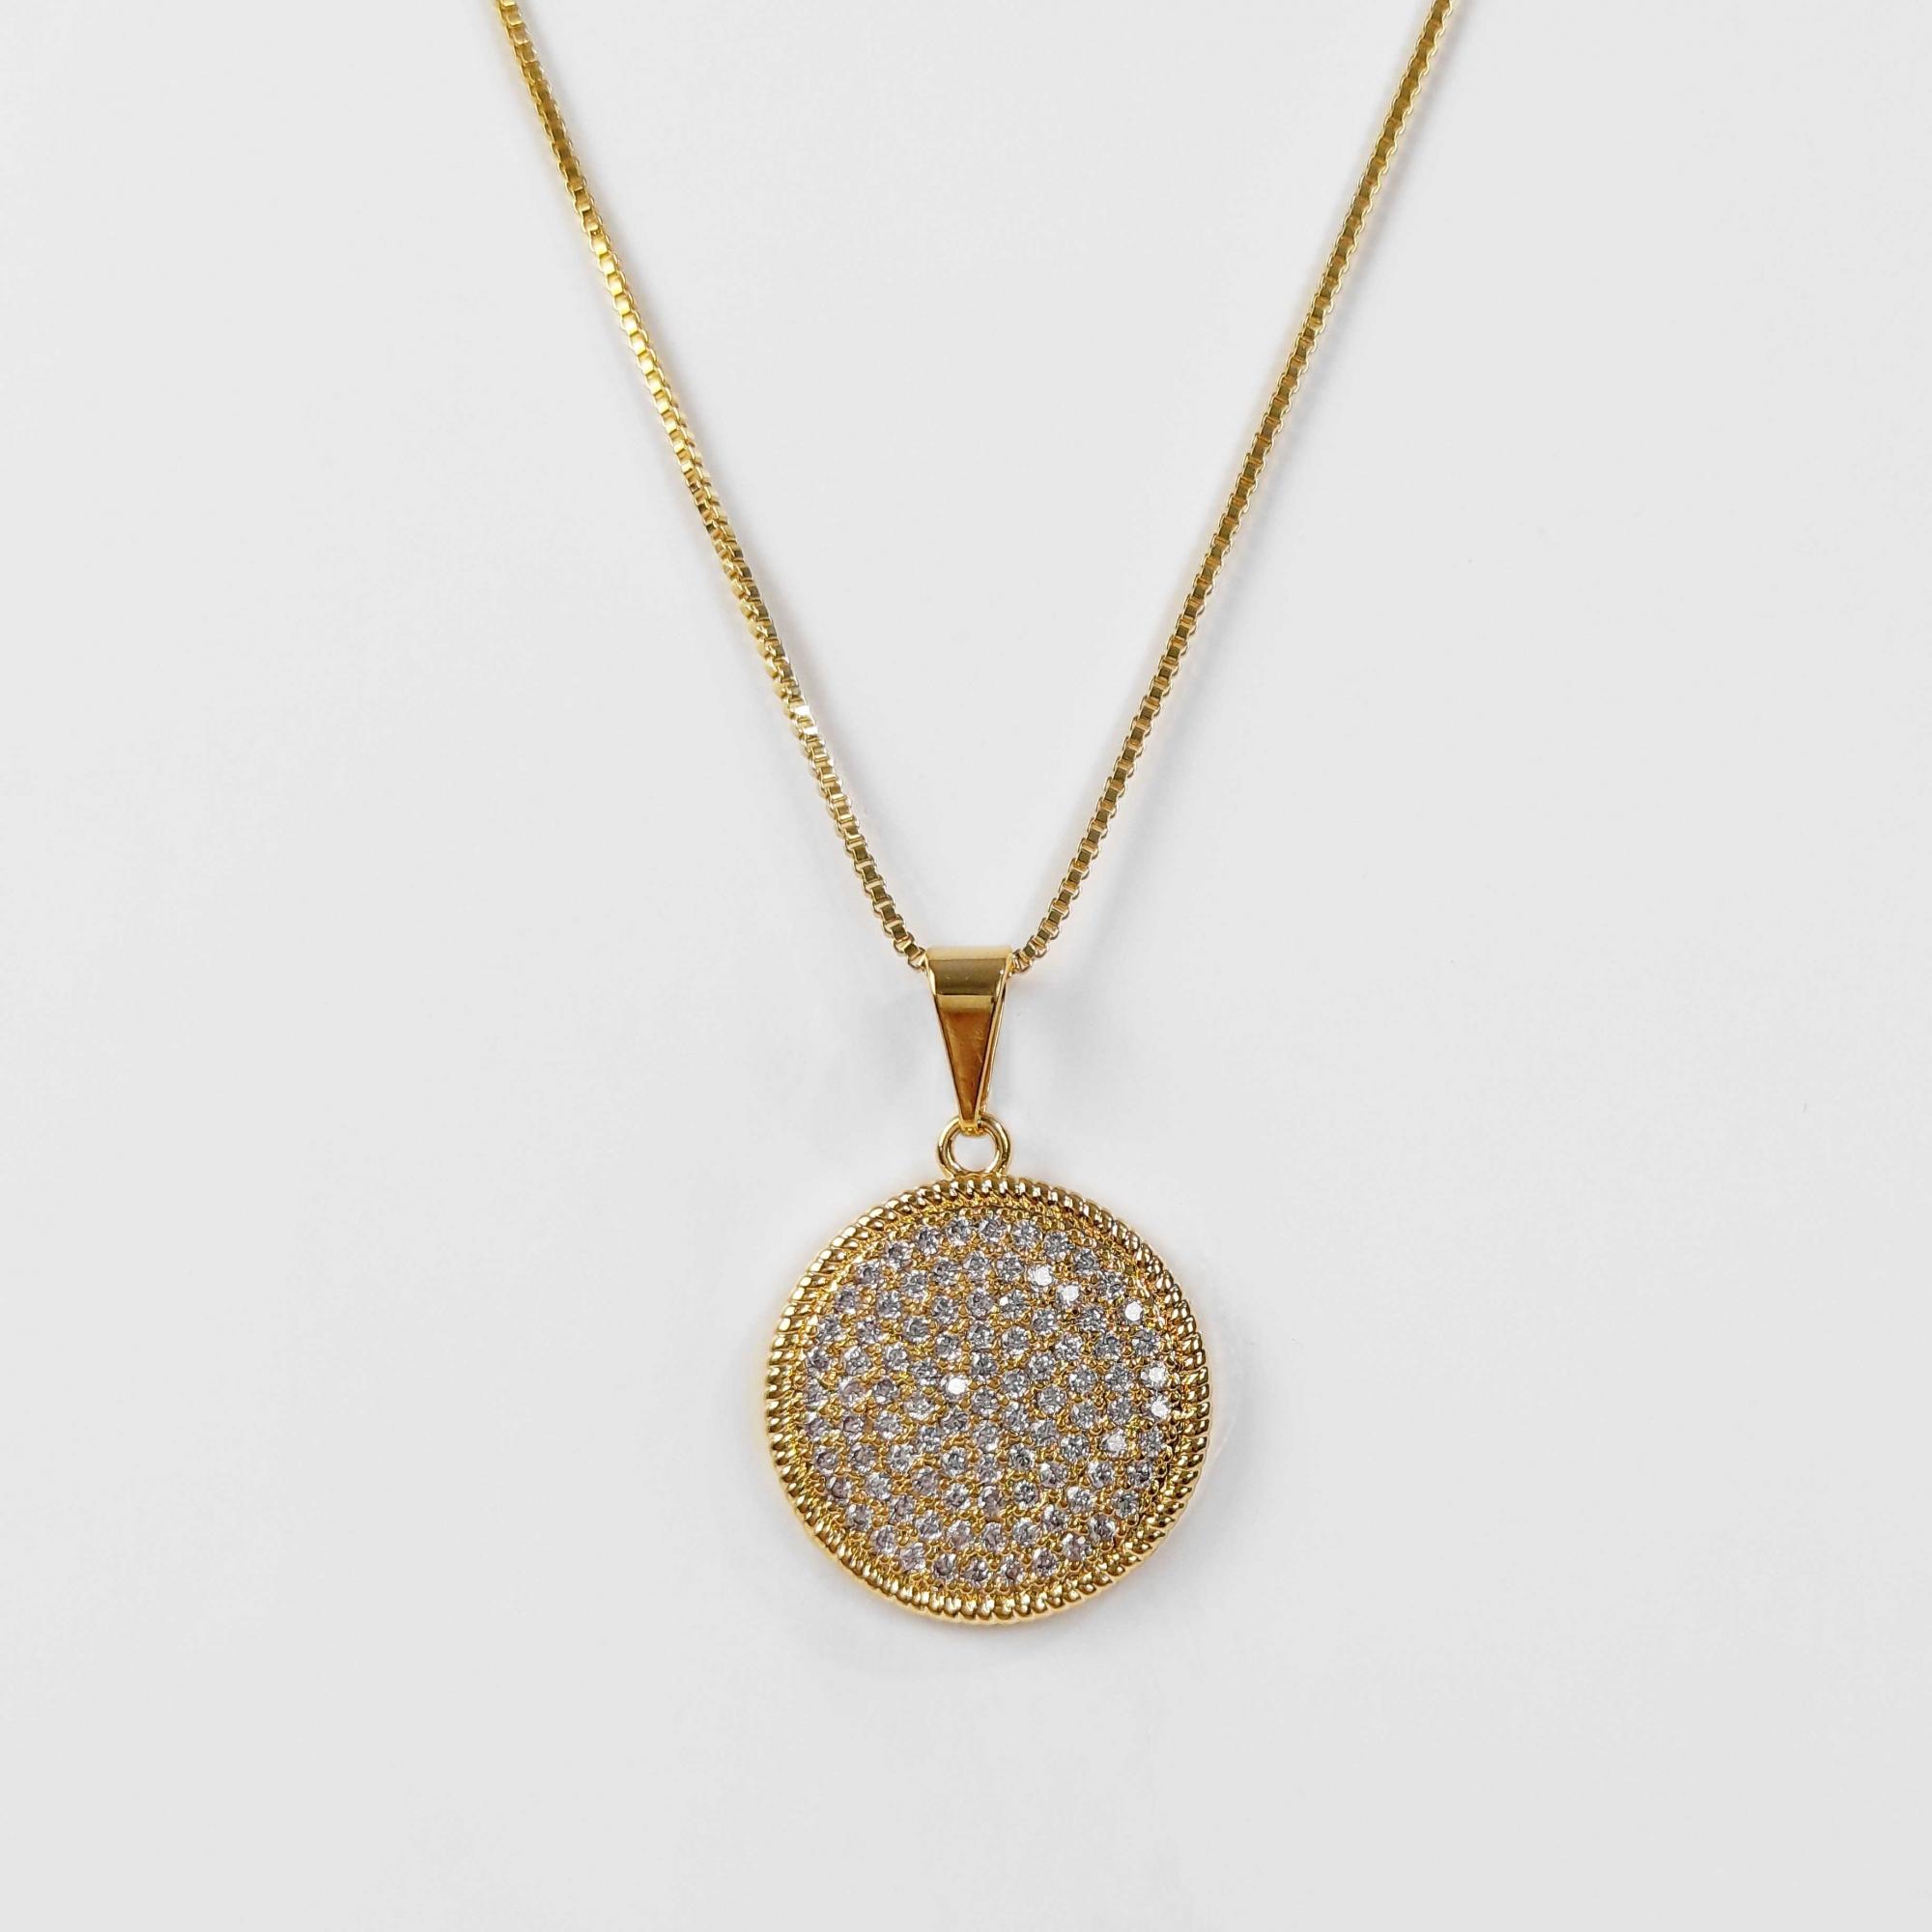 Gargantilha Mandala Cravejada Zircônias Folheado Ouro 18K  - Lunozê Joias